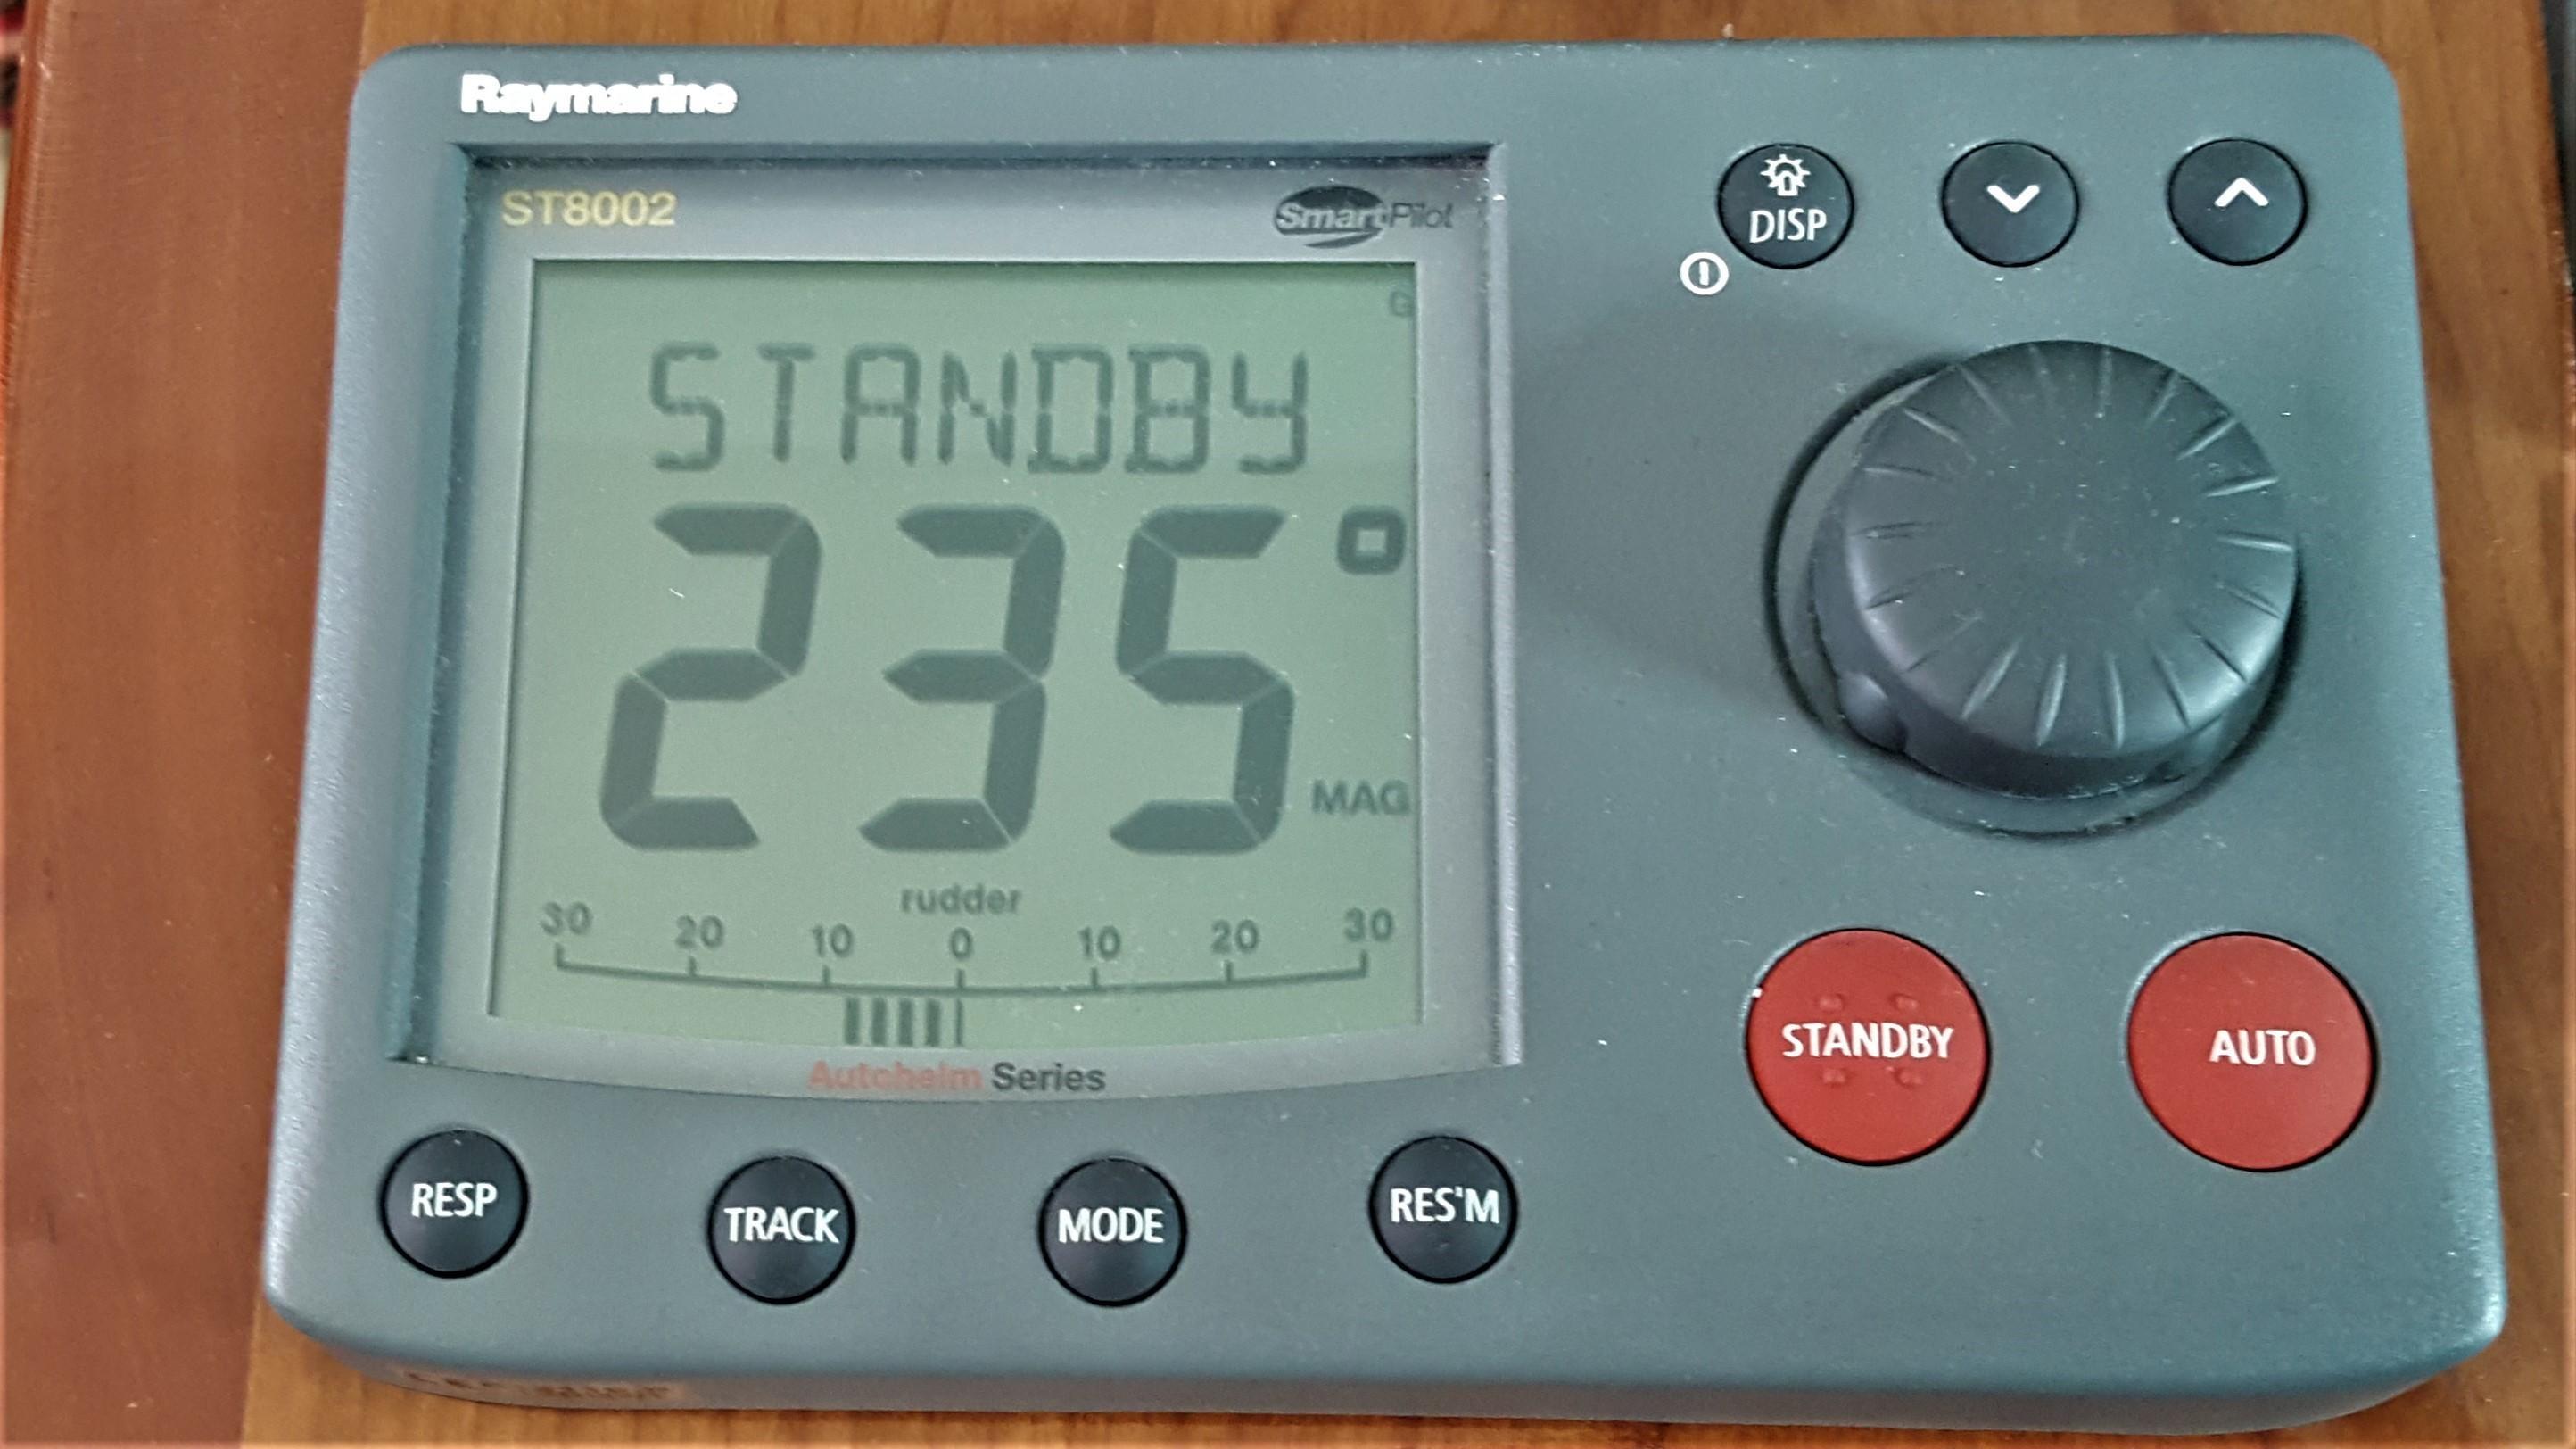 Raymarine ST8002 Autopilot